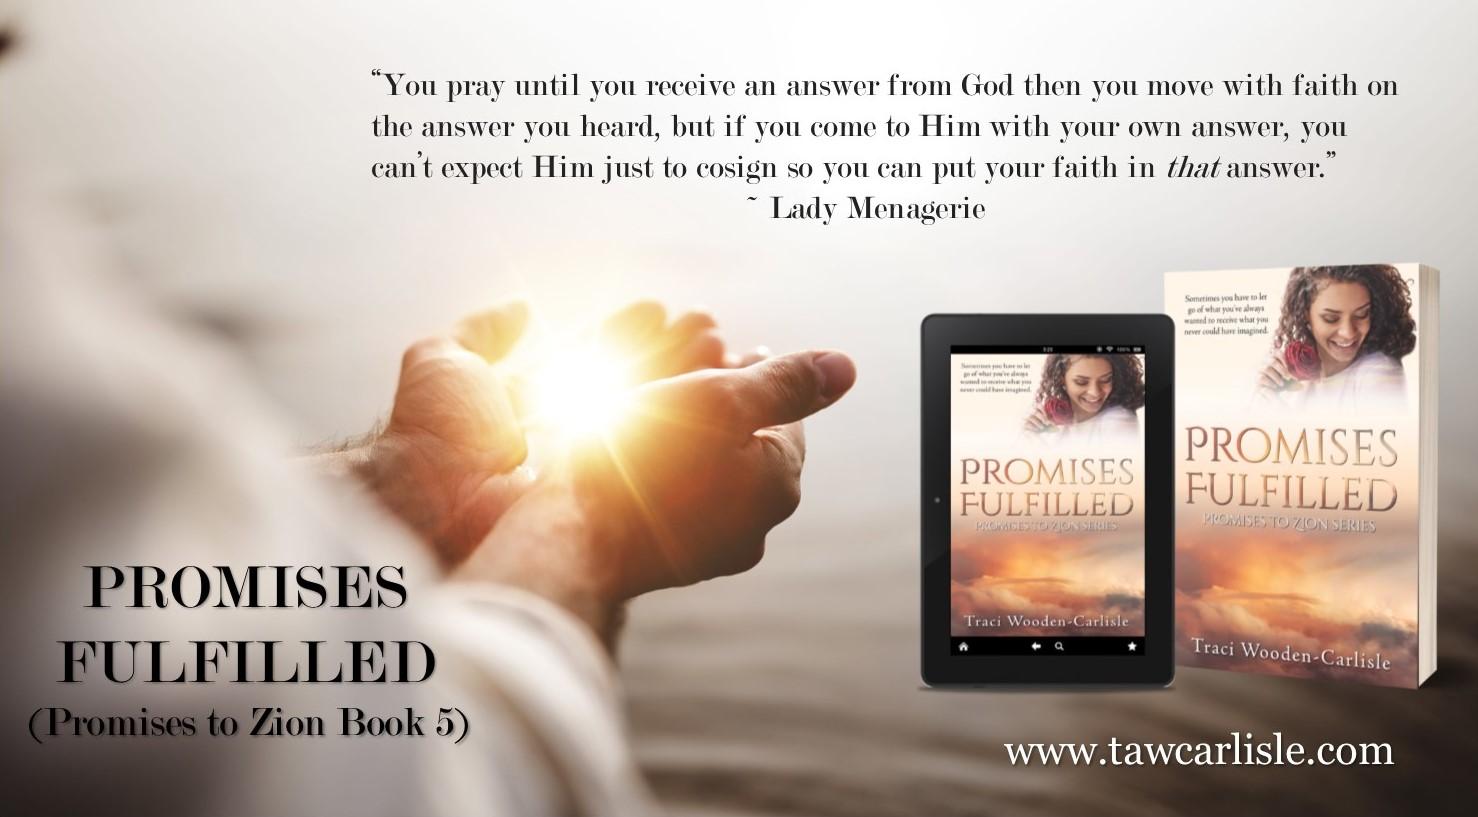 Promises Fulfilled Promo Faith is